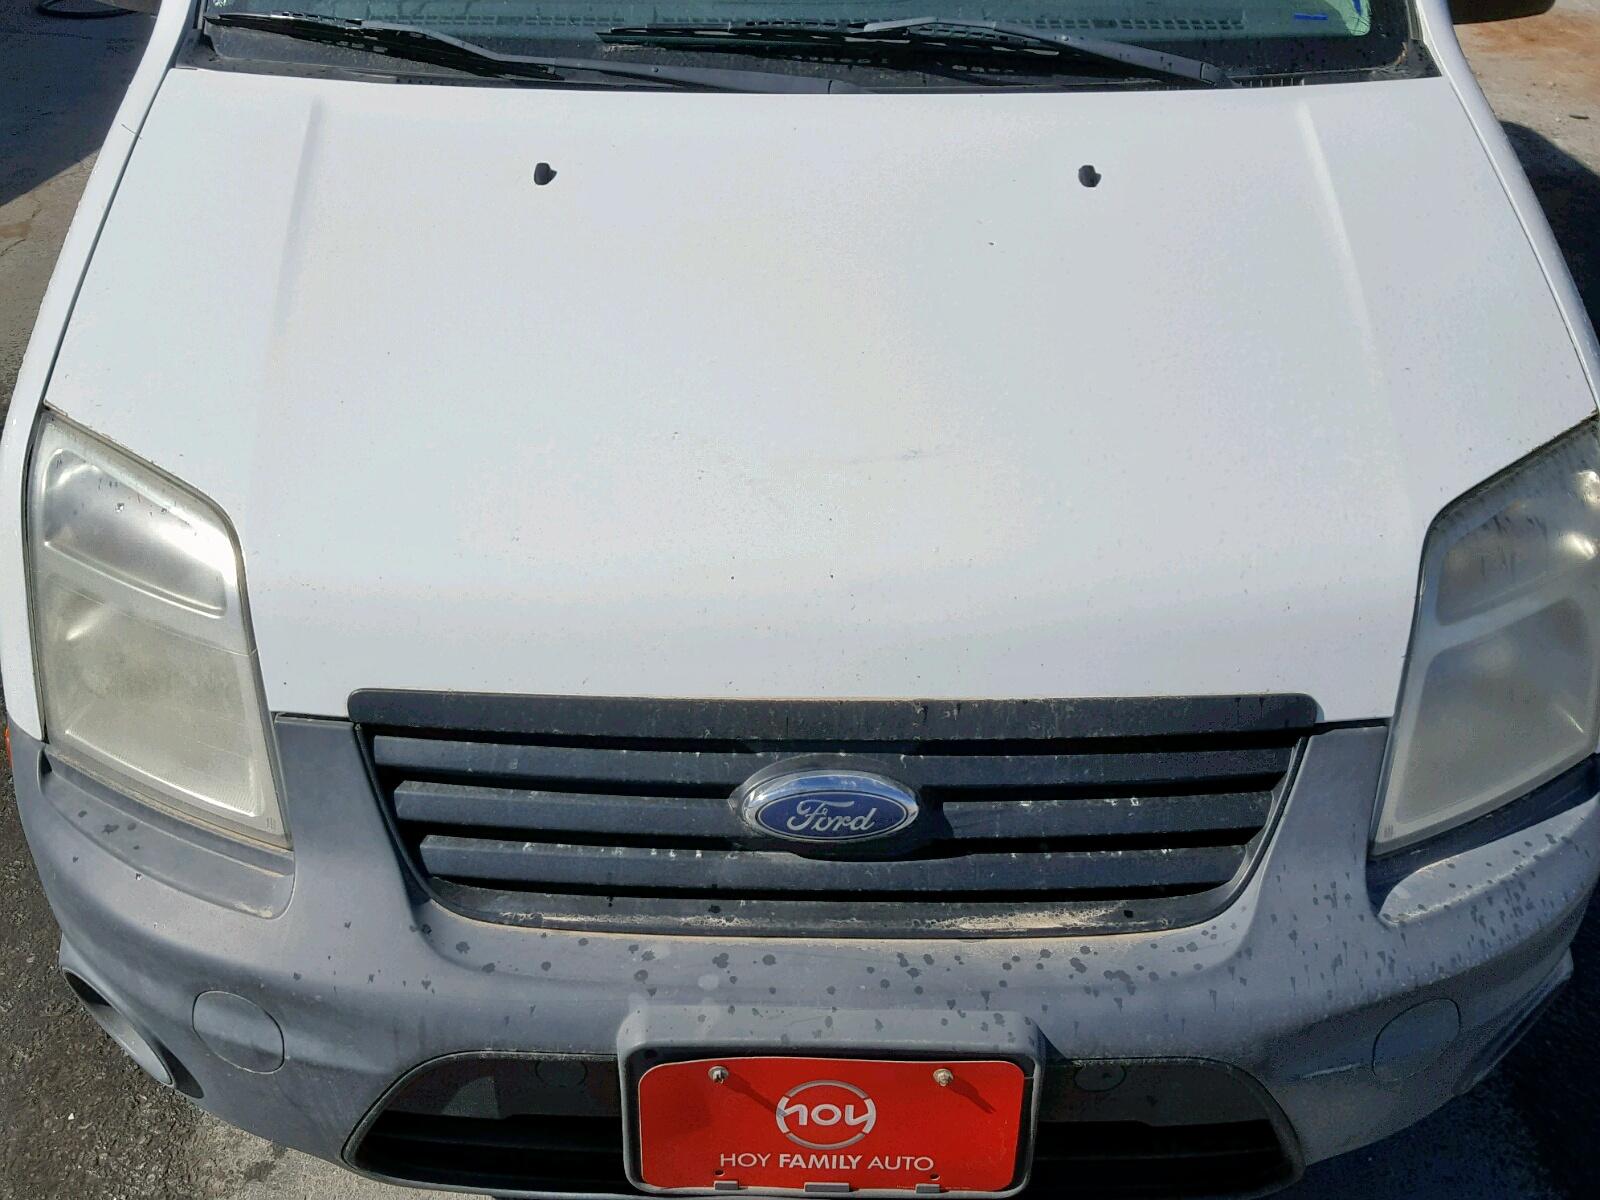 NM0LS7CN6CT096661 - 2012 Ford Transit Co 2.0L inside view